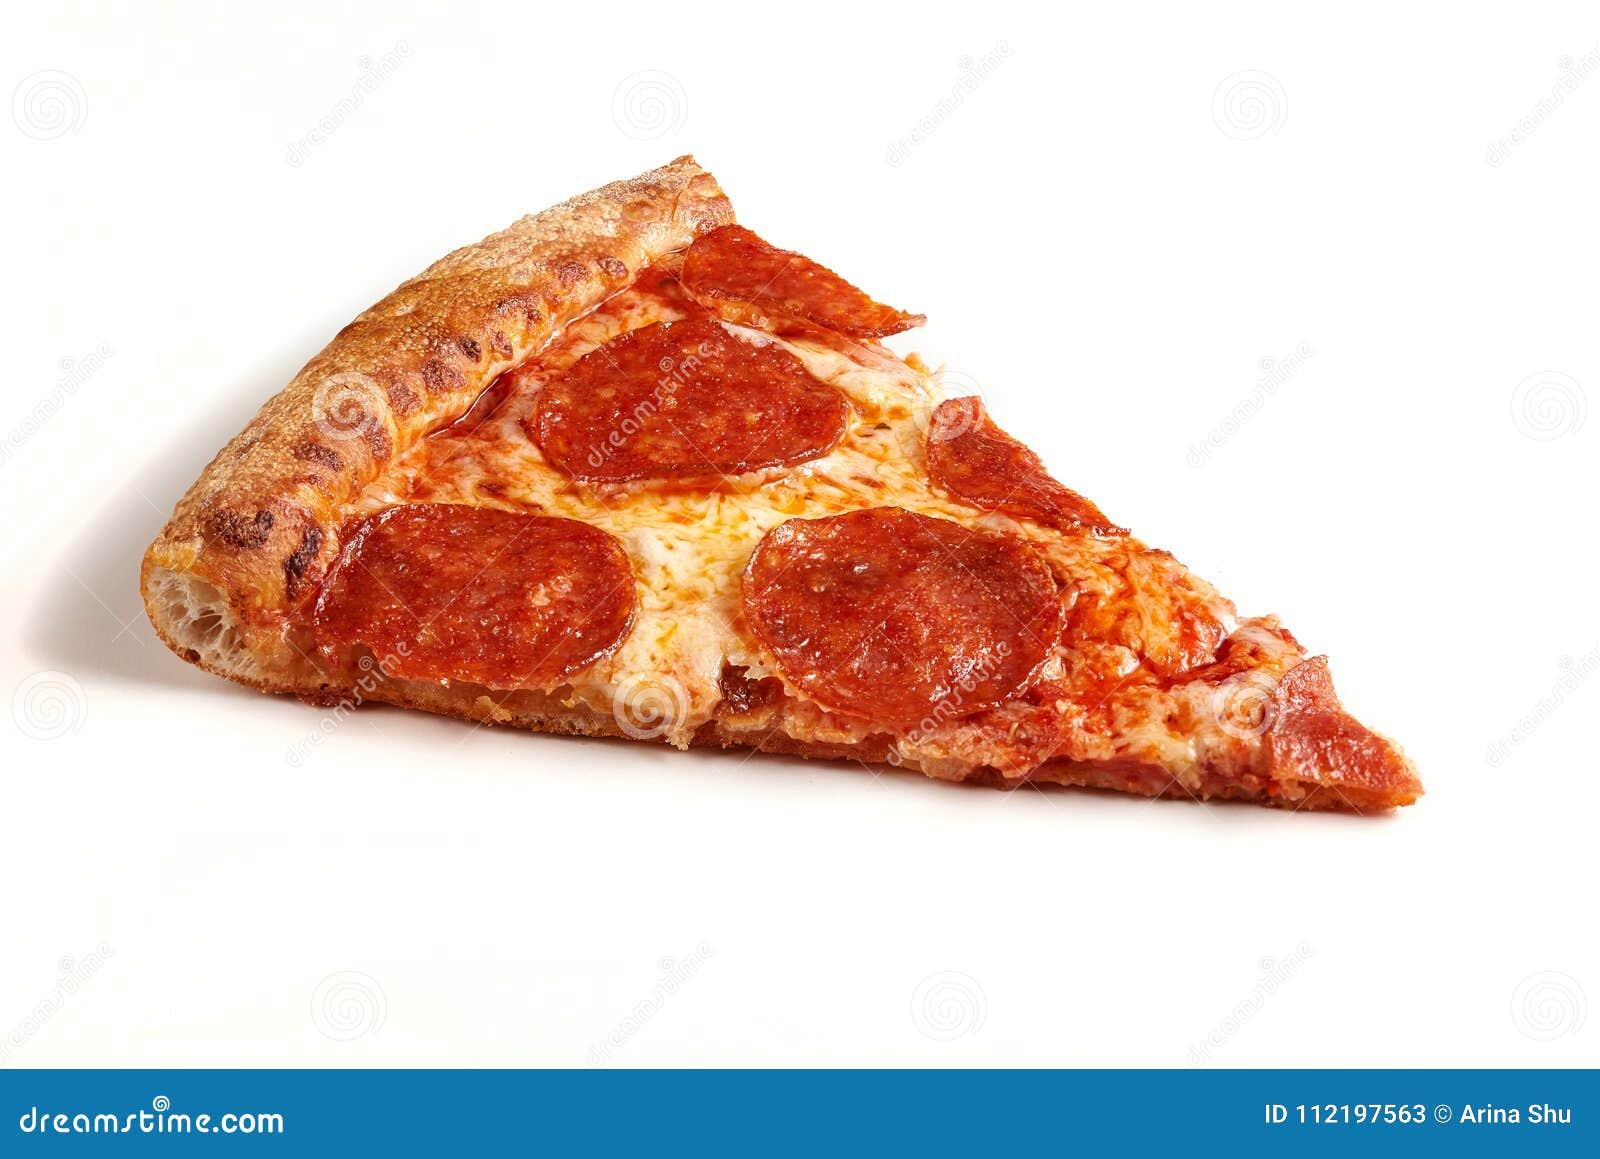 Fatia de pizza de Pepperoni original clássica isolada no fundo branco